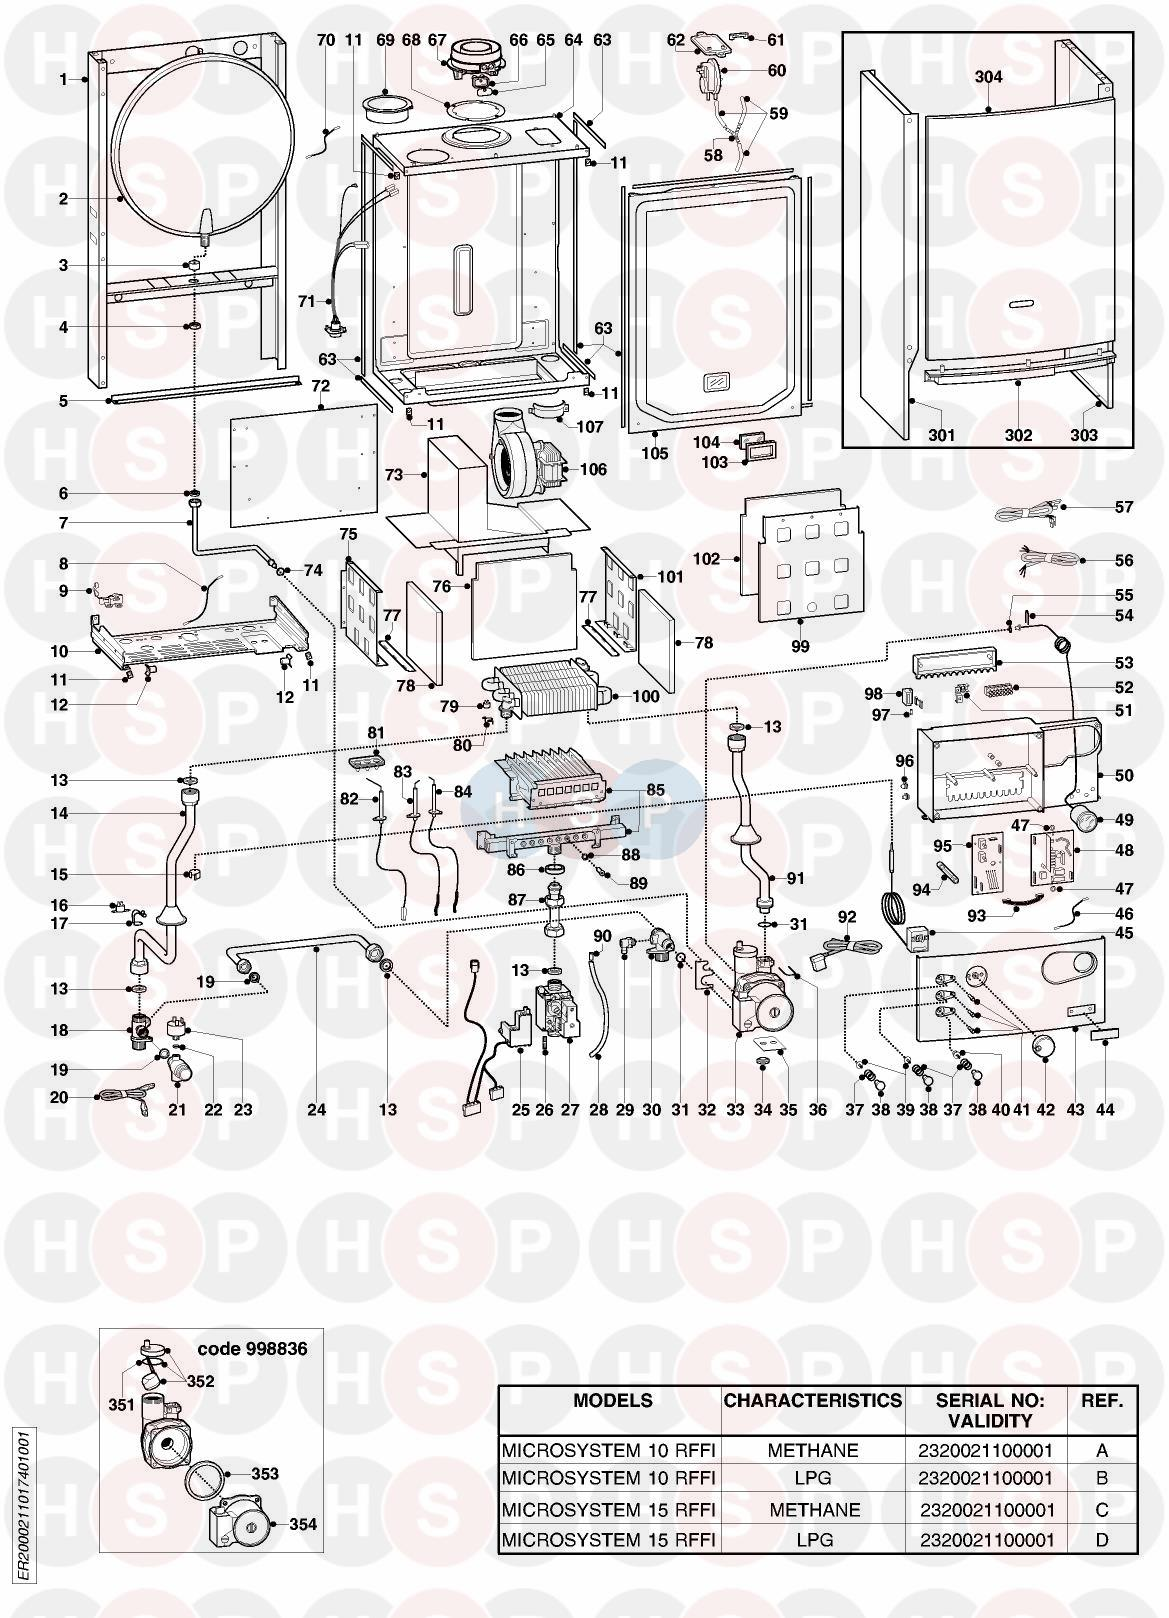 Ariston MICROSYSTEM 10 RFFI EDITION1 Appliance Diagram